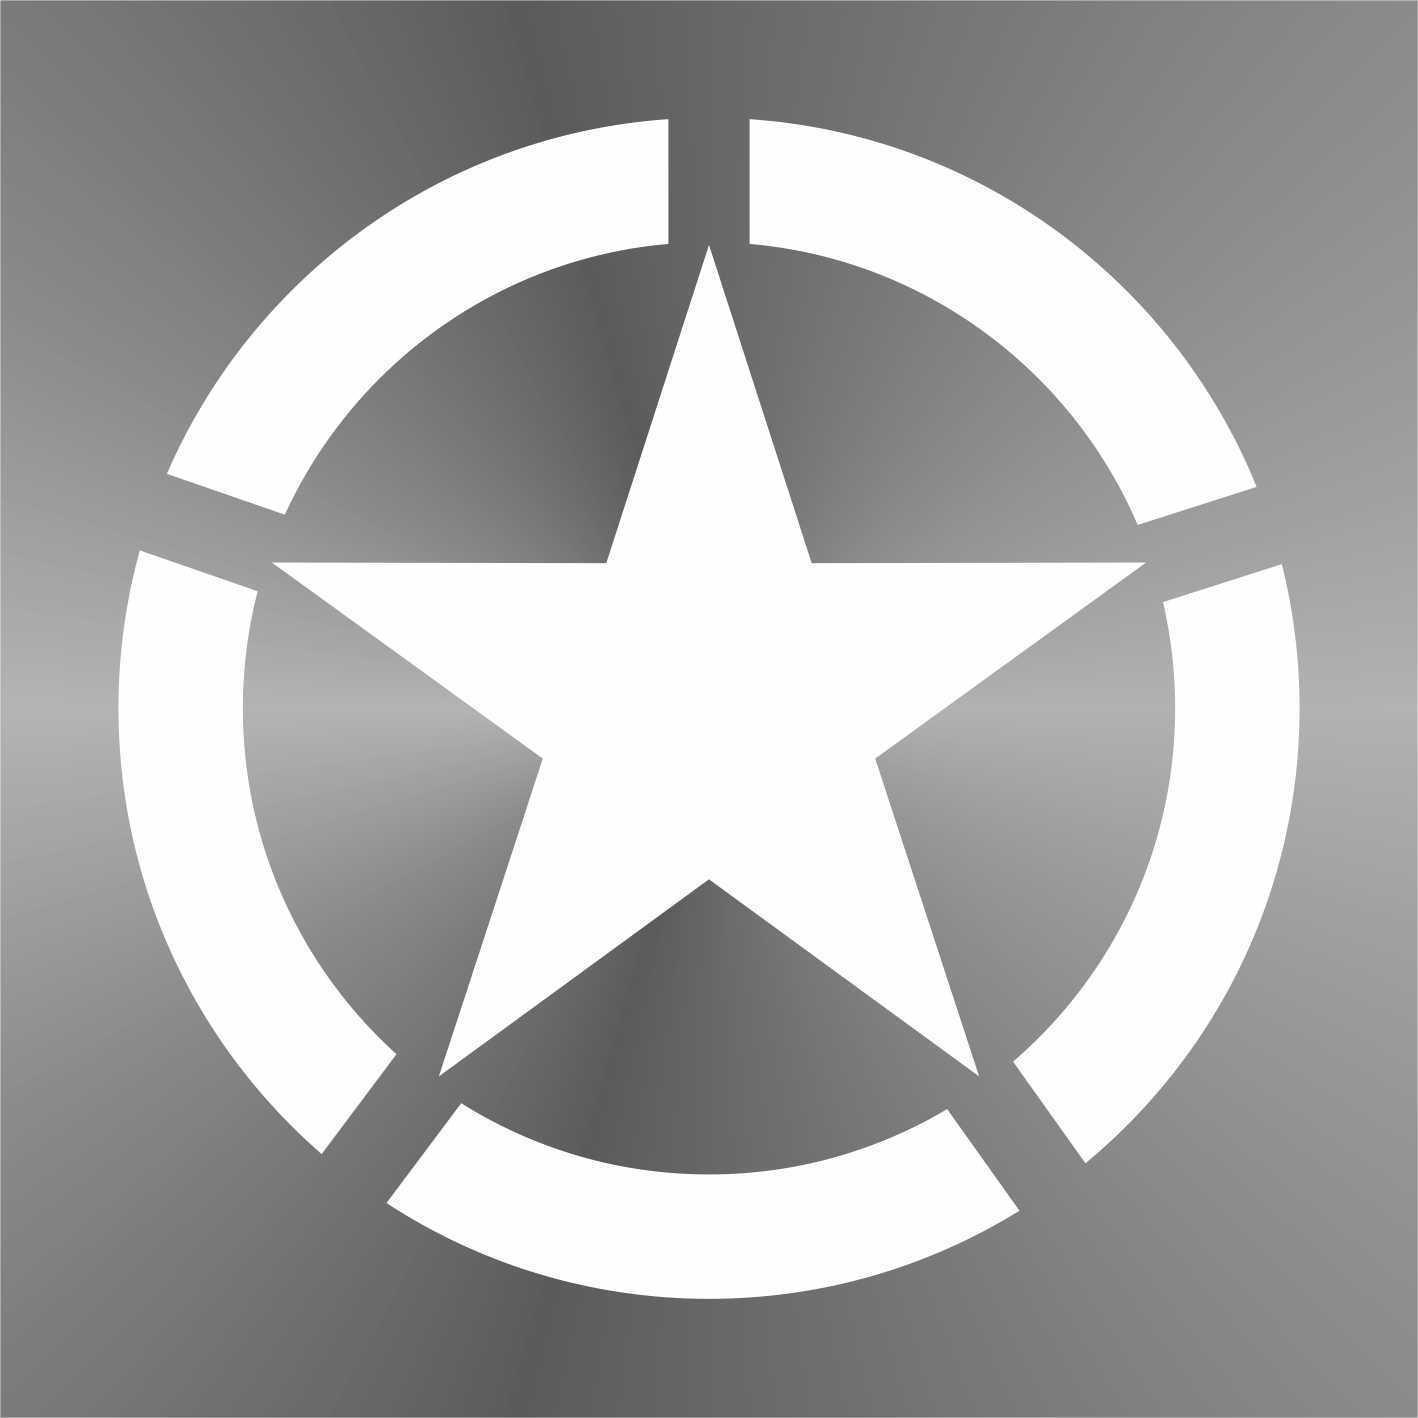 Sticker Stella Militare Military Star Militä r Sterne estrella de los militares é toiles militaire - Decal Cars Motorcycles Helmet Wall Camper Bike Adesivo Adhesive Autocollant Pegatina Aufkleber - cm 10 erreinge